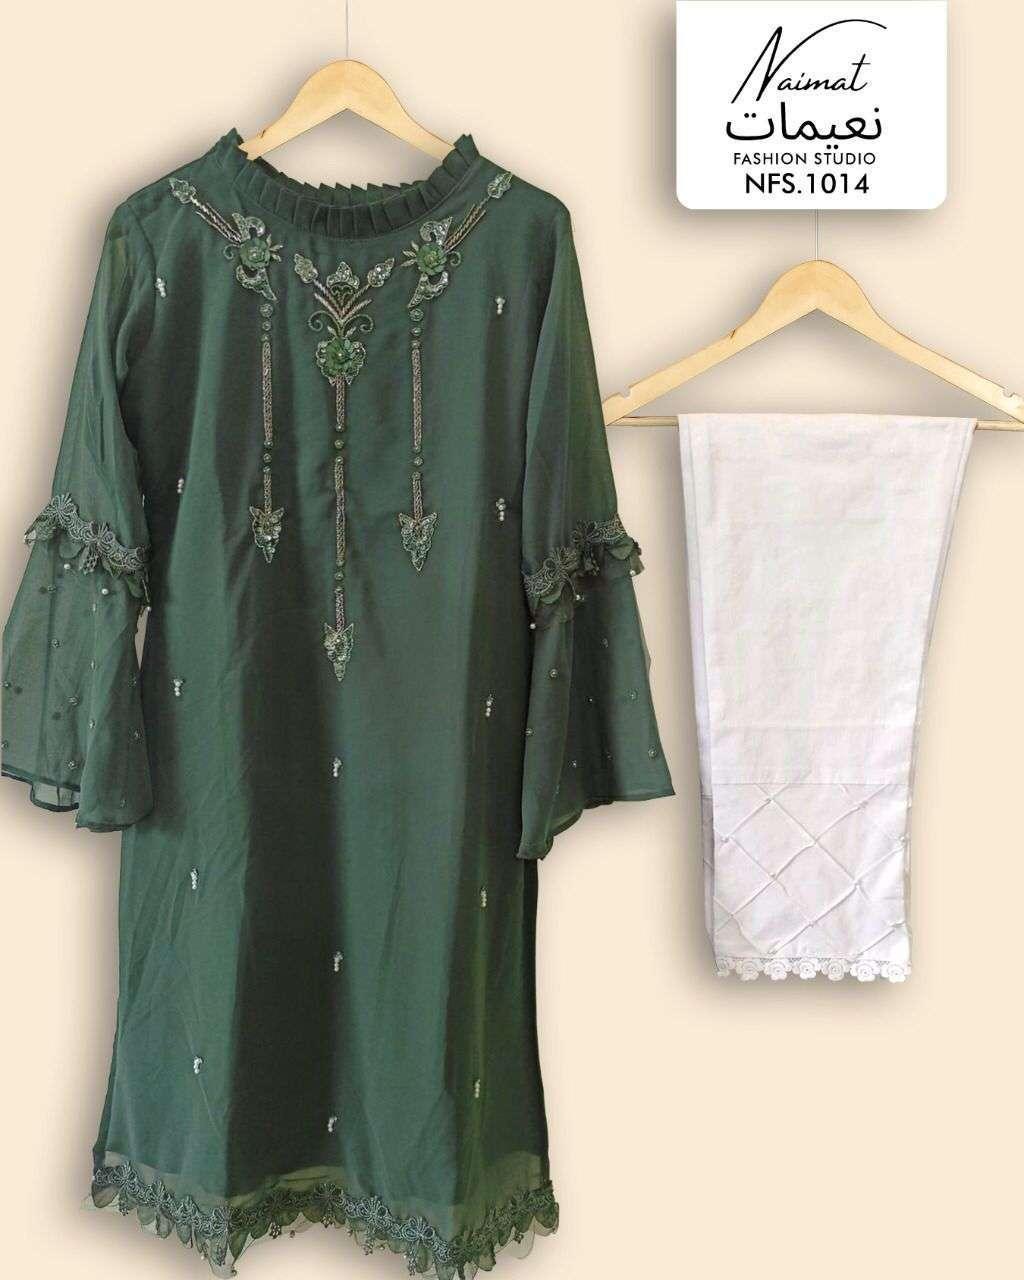 naimat fashion studio nfs-1014 Pure Georgette Handwork kurti